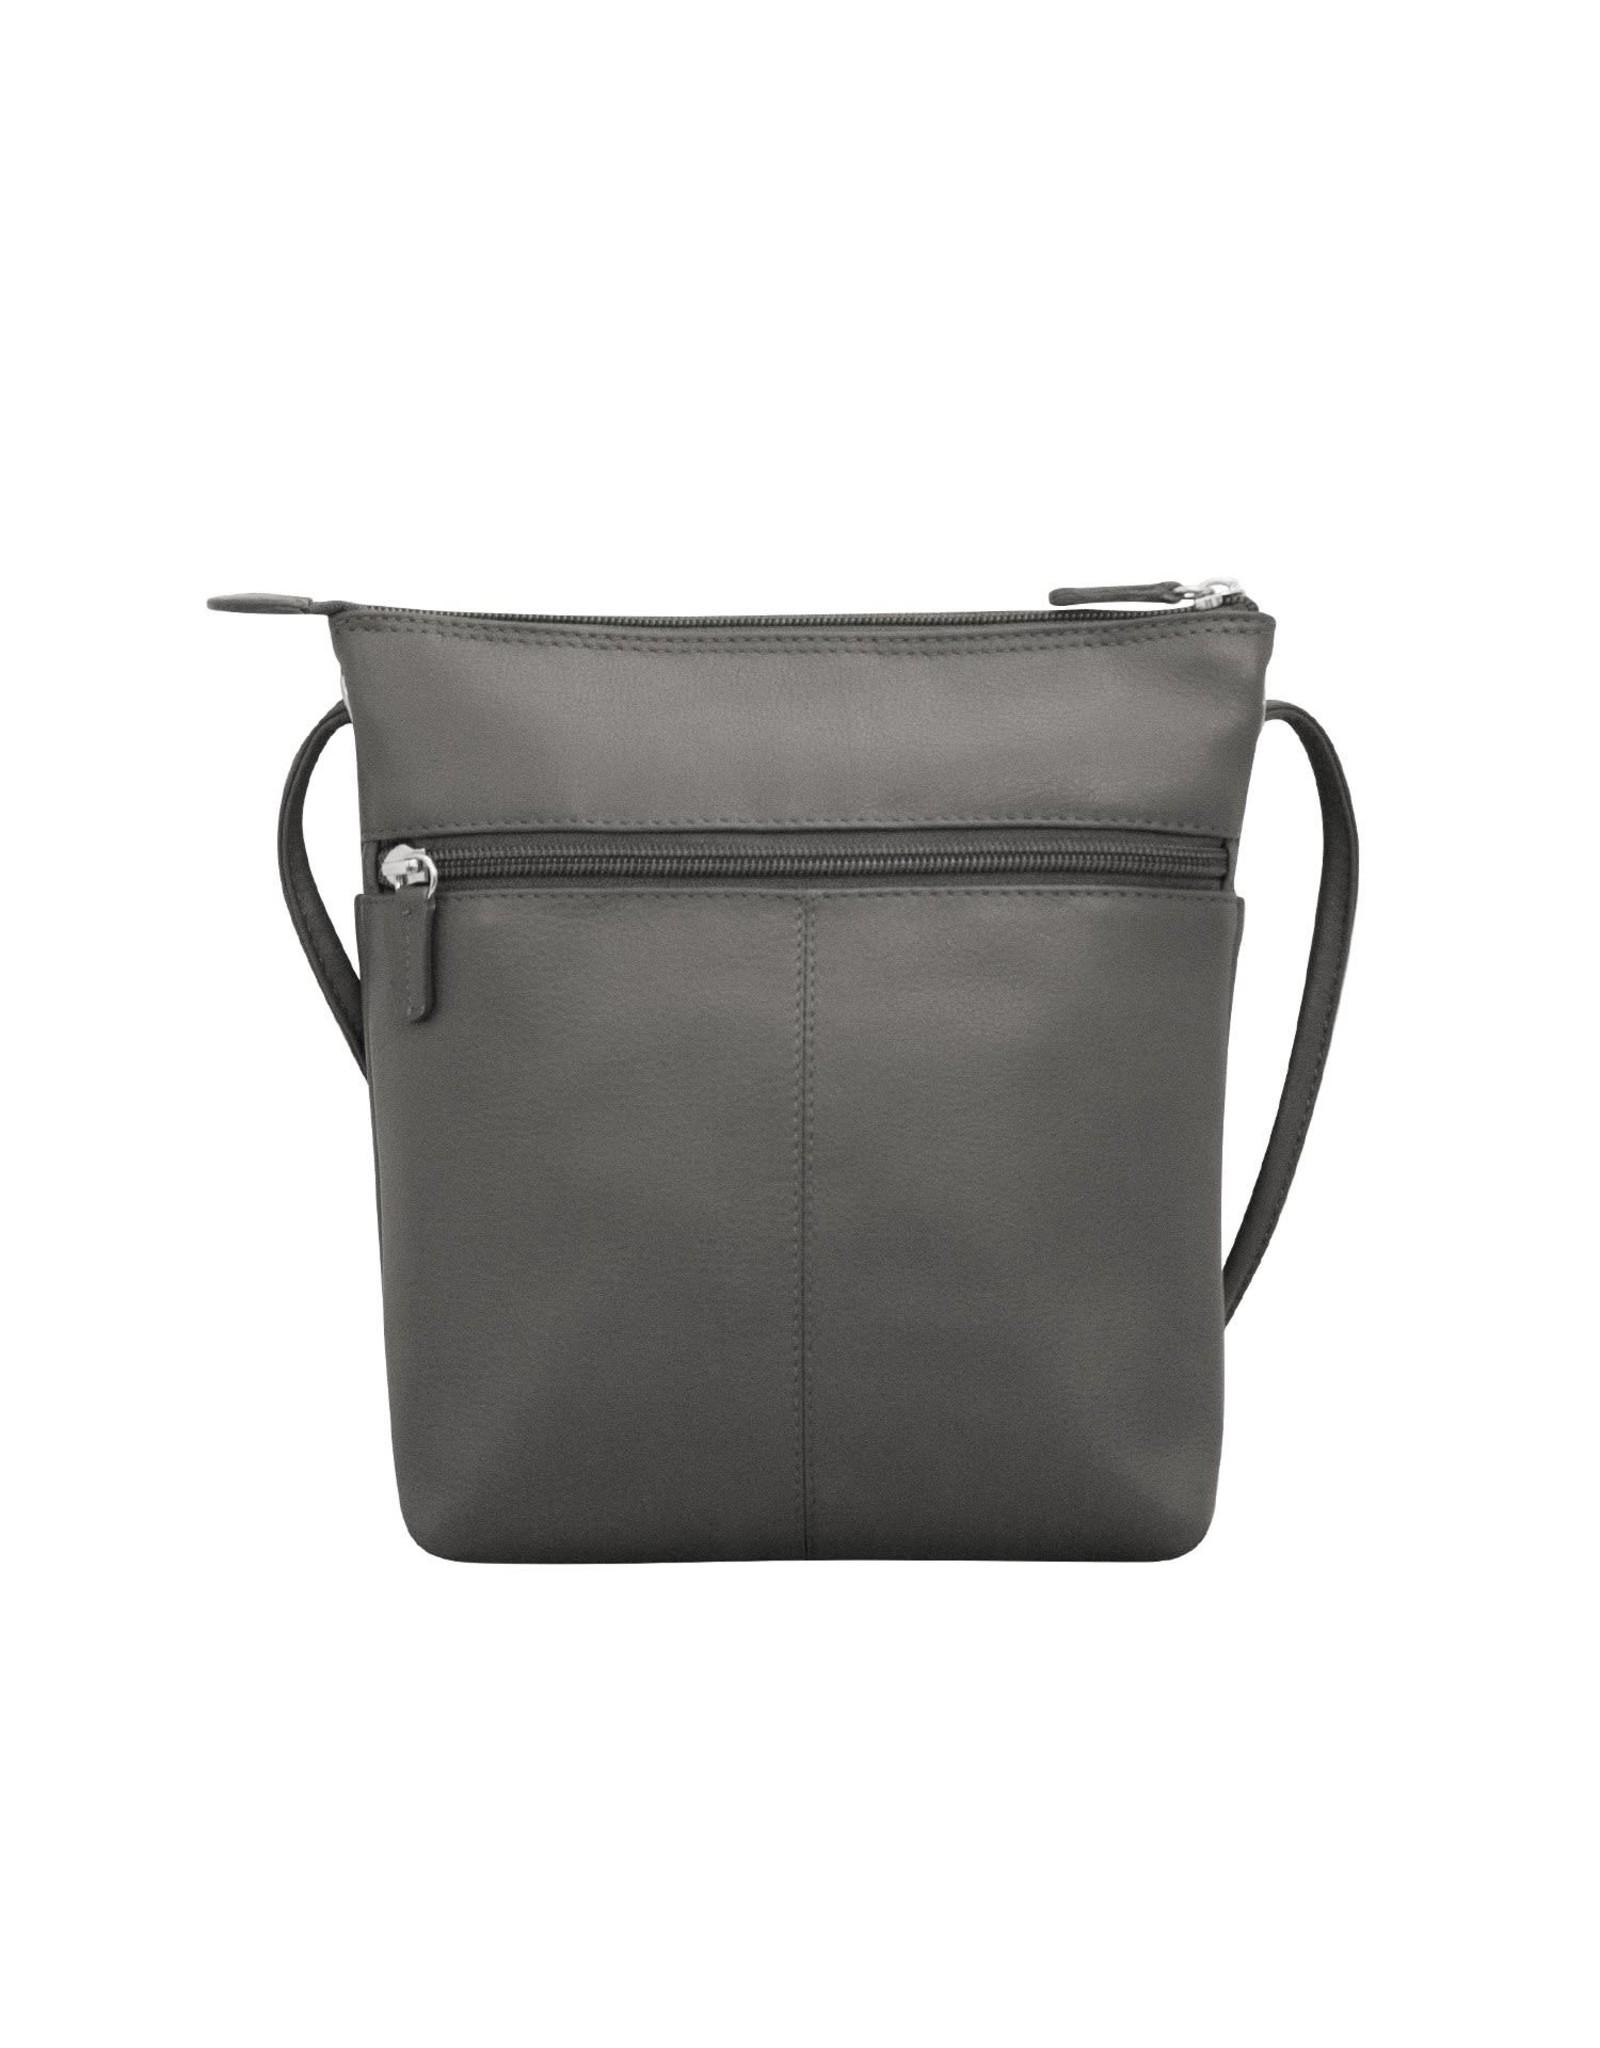 Leather Handbags and Accessories 6661 Yellow - Midi Sac